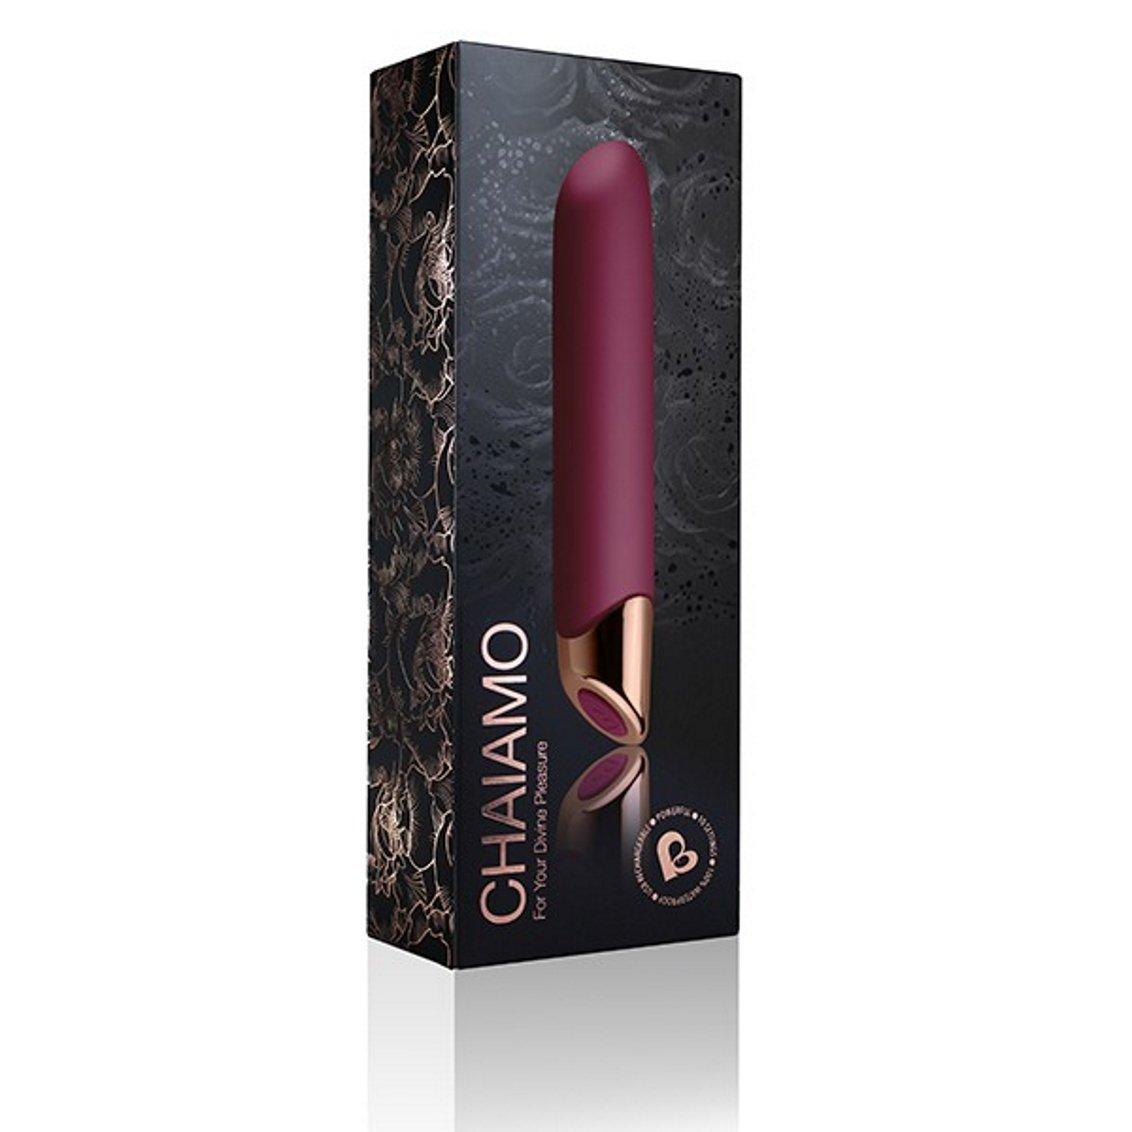 Chaiamo Rechargeable Silicone Vibrator - Black, Burgundy